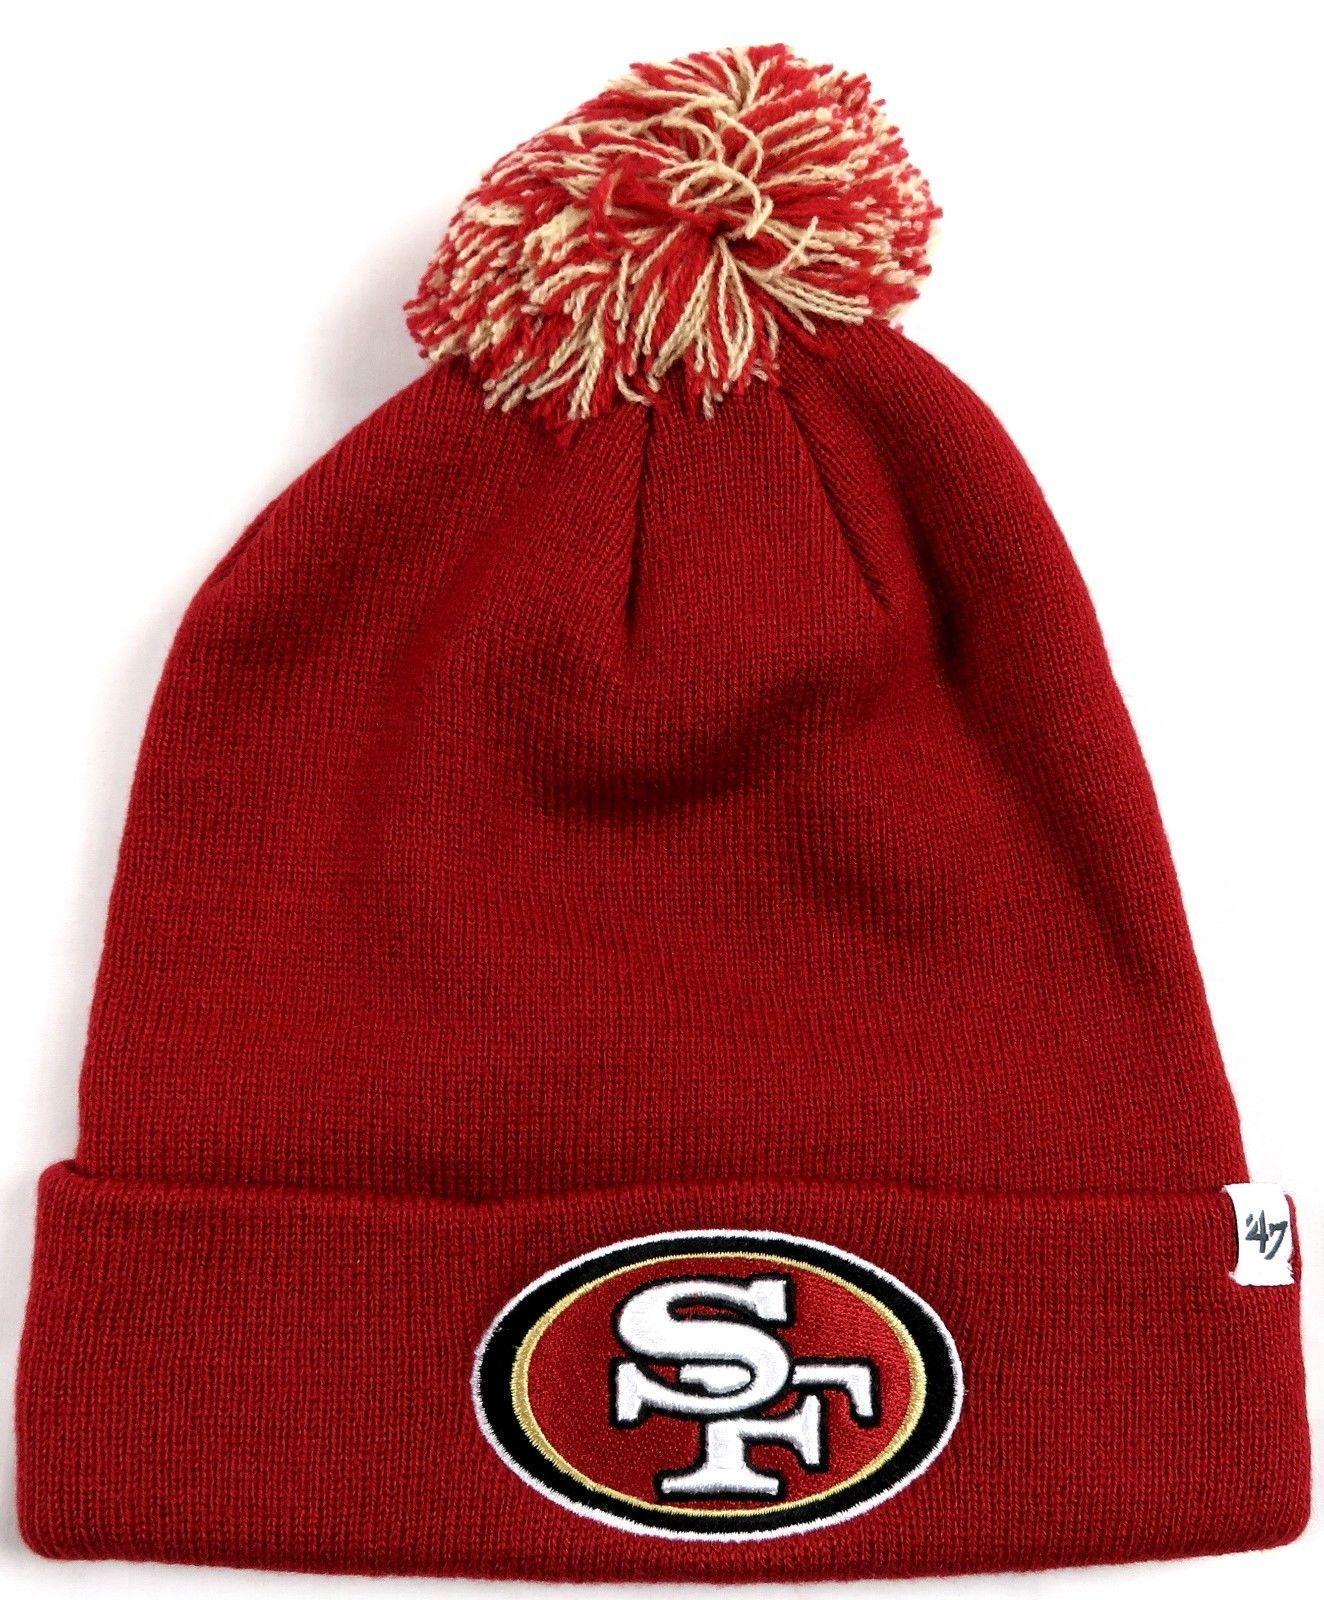 San Francisco 49ers Raised Knit Cuff Pom Hat NFL Men's Beanie One Size